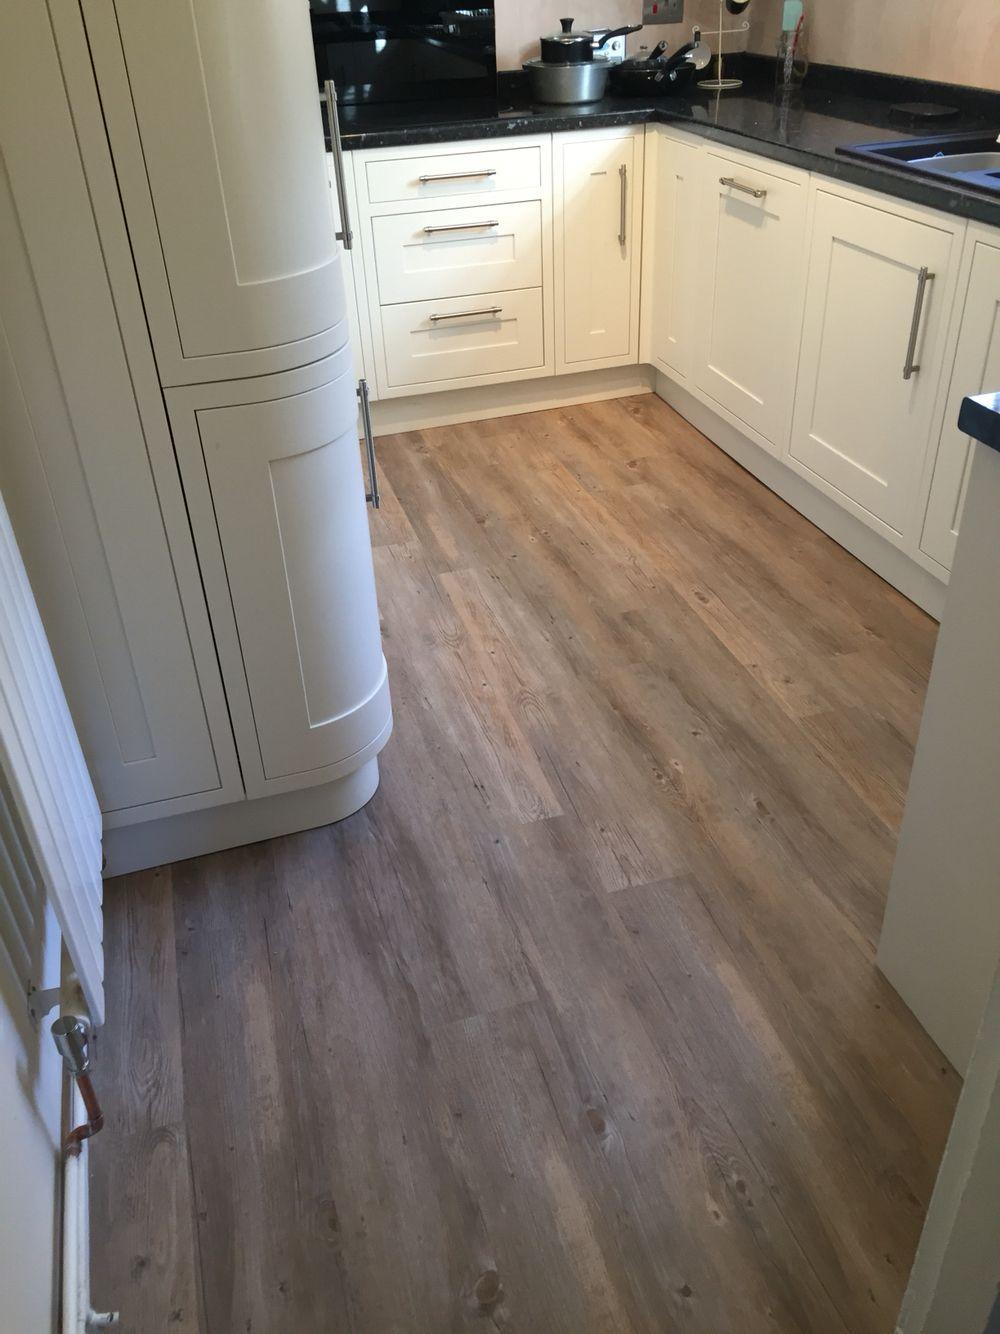 Karndean Vangogh Country Oak Karndean Design Flooring Kitchen Design Small Vinyl Plank Flooring